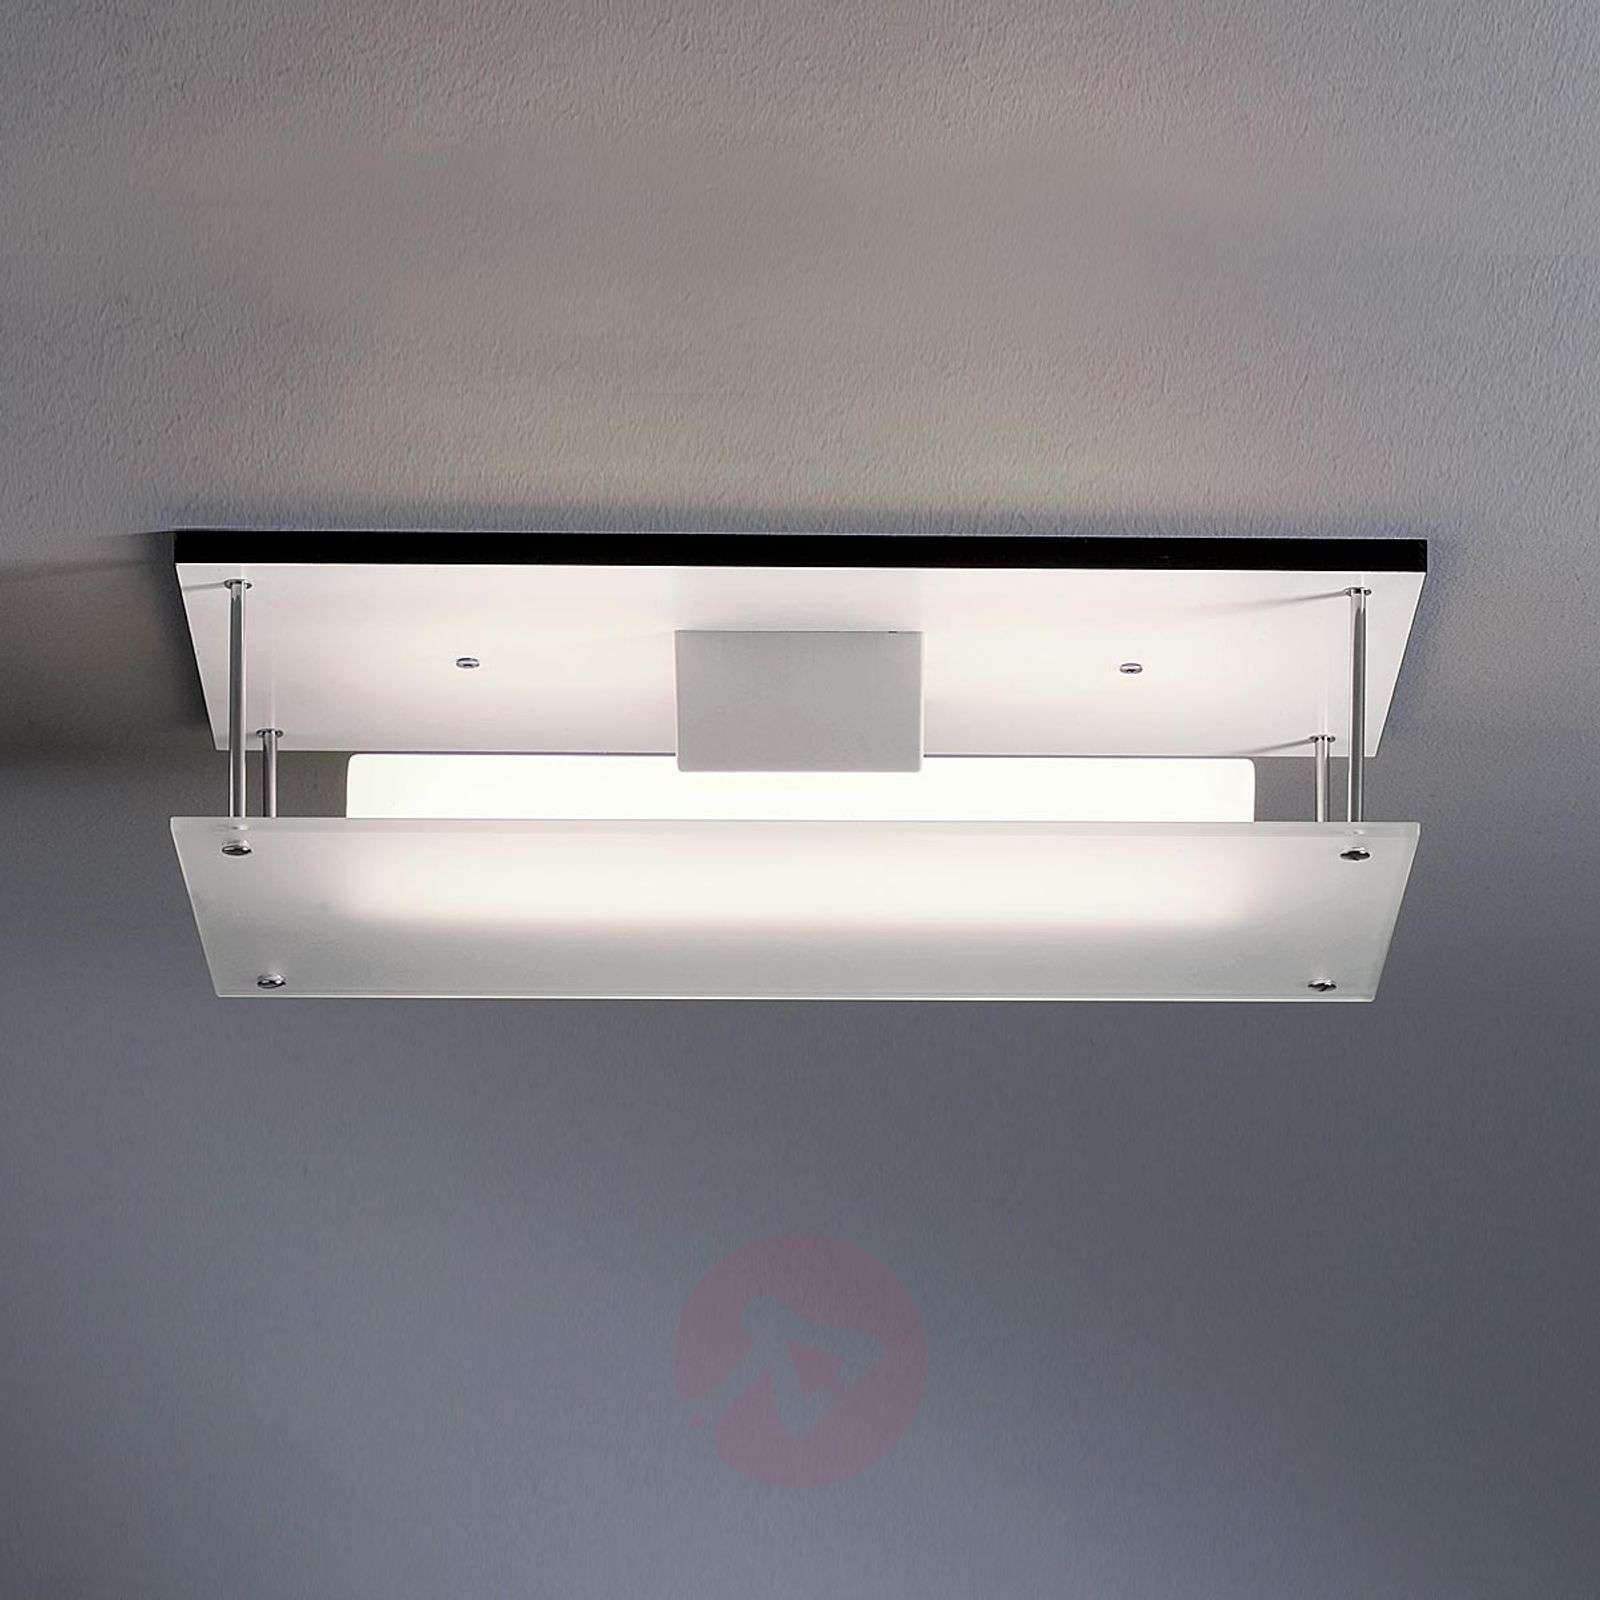 German Art Deco ceiling light-9030080-01